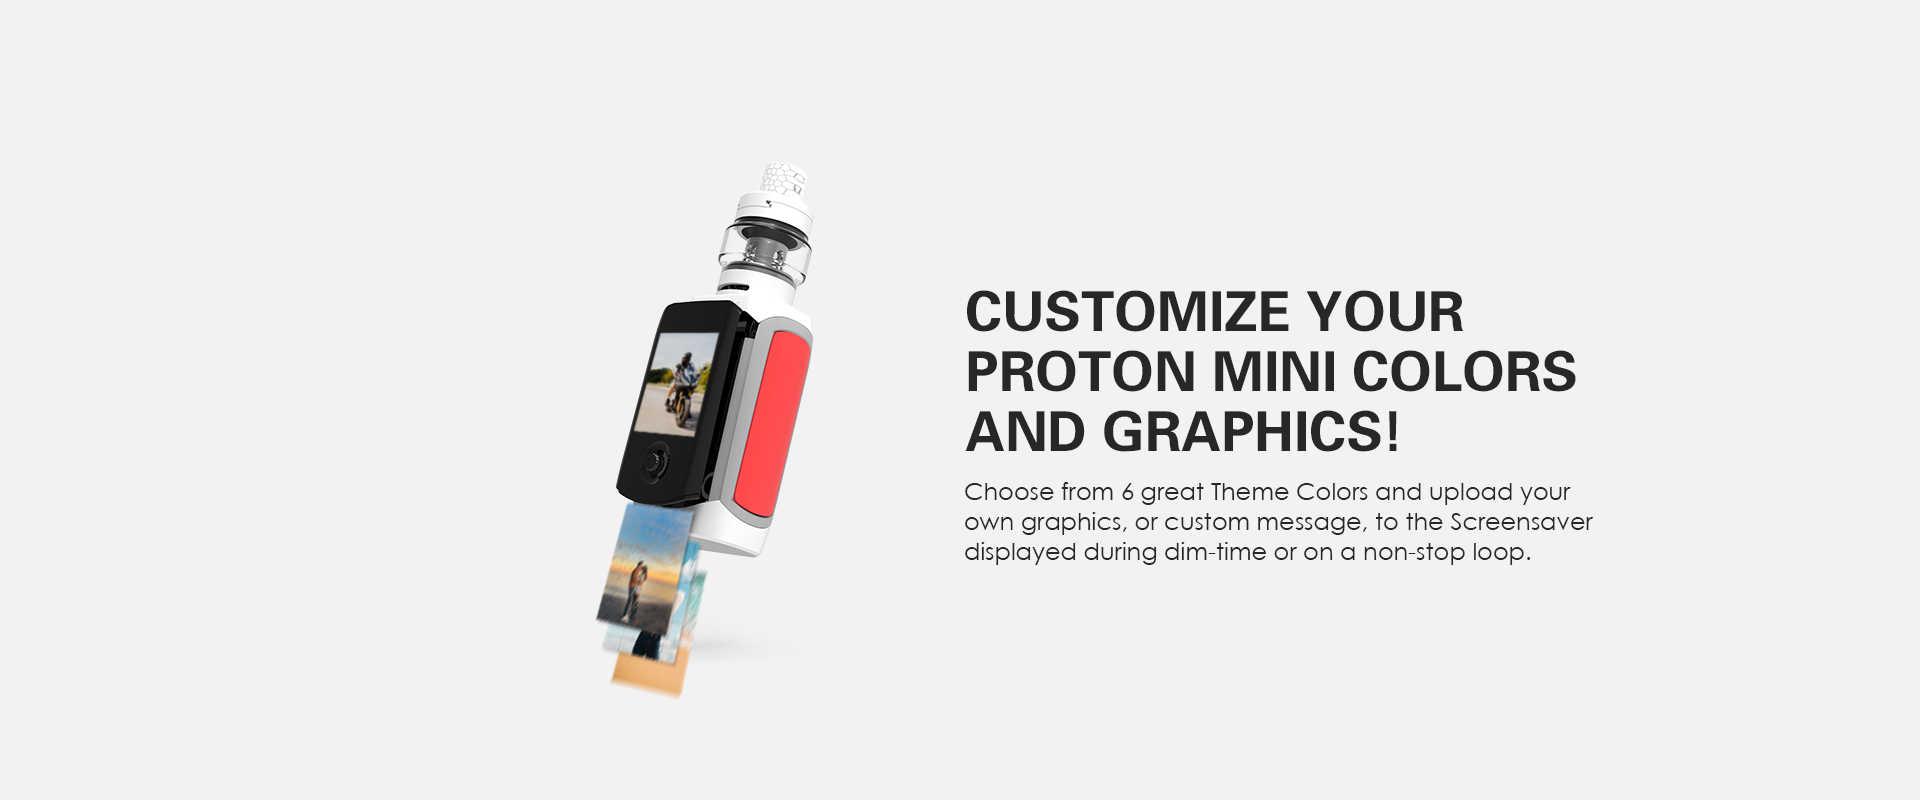 Proton Mini Ajax Kit Specifications